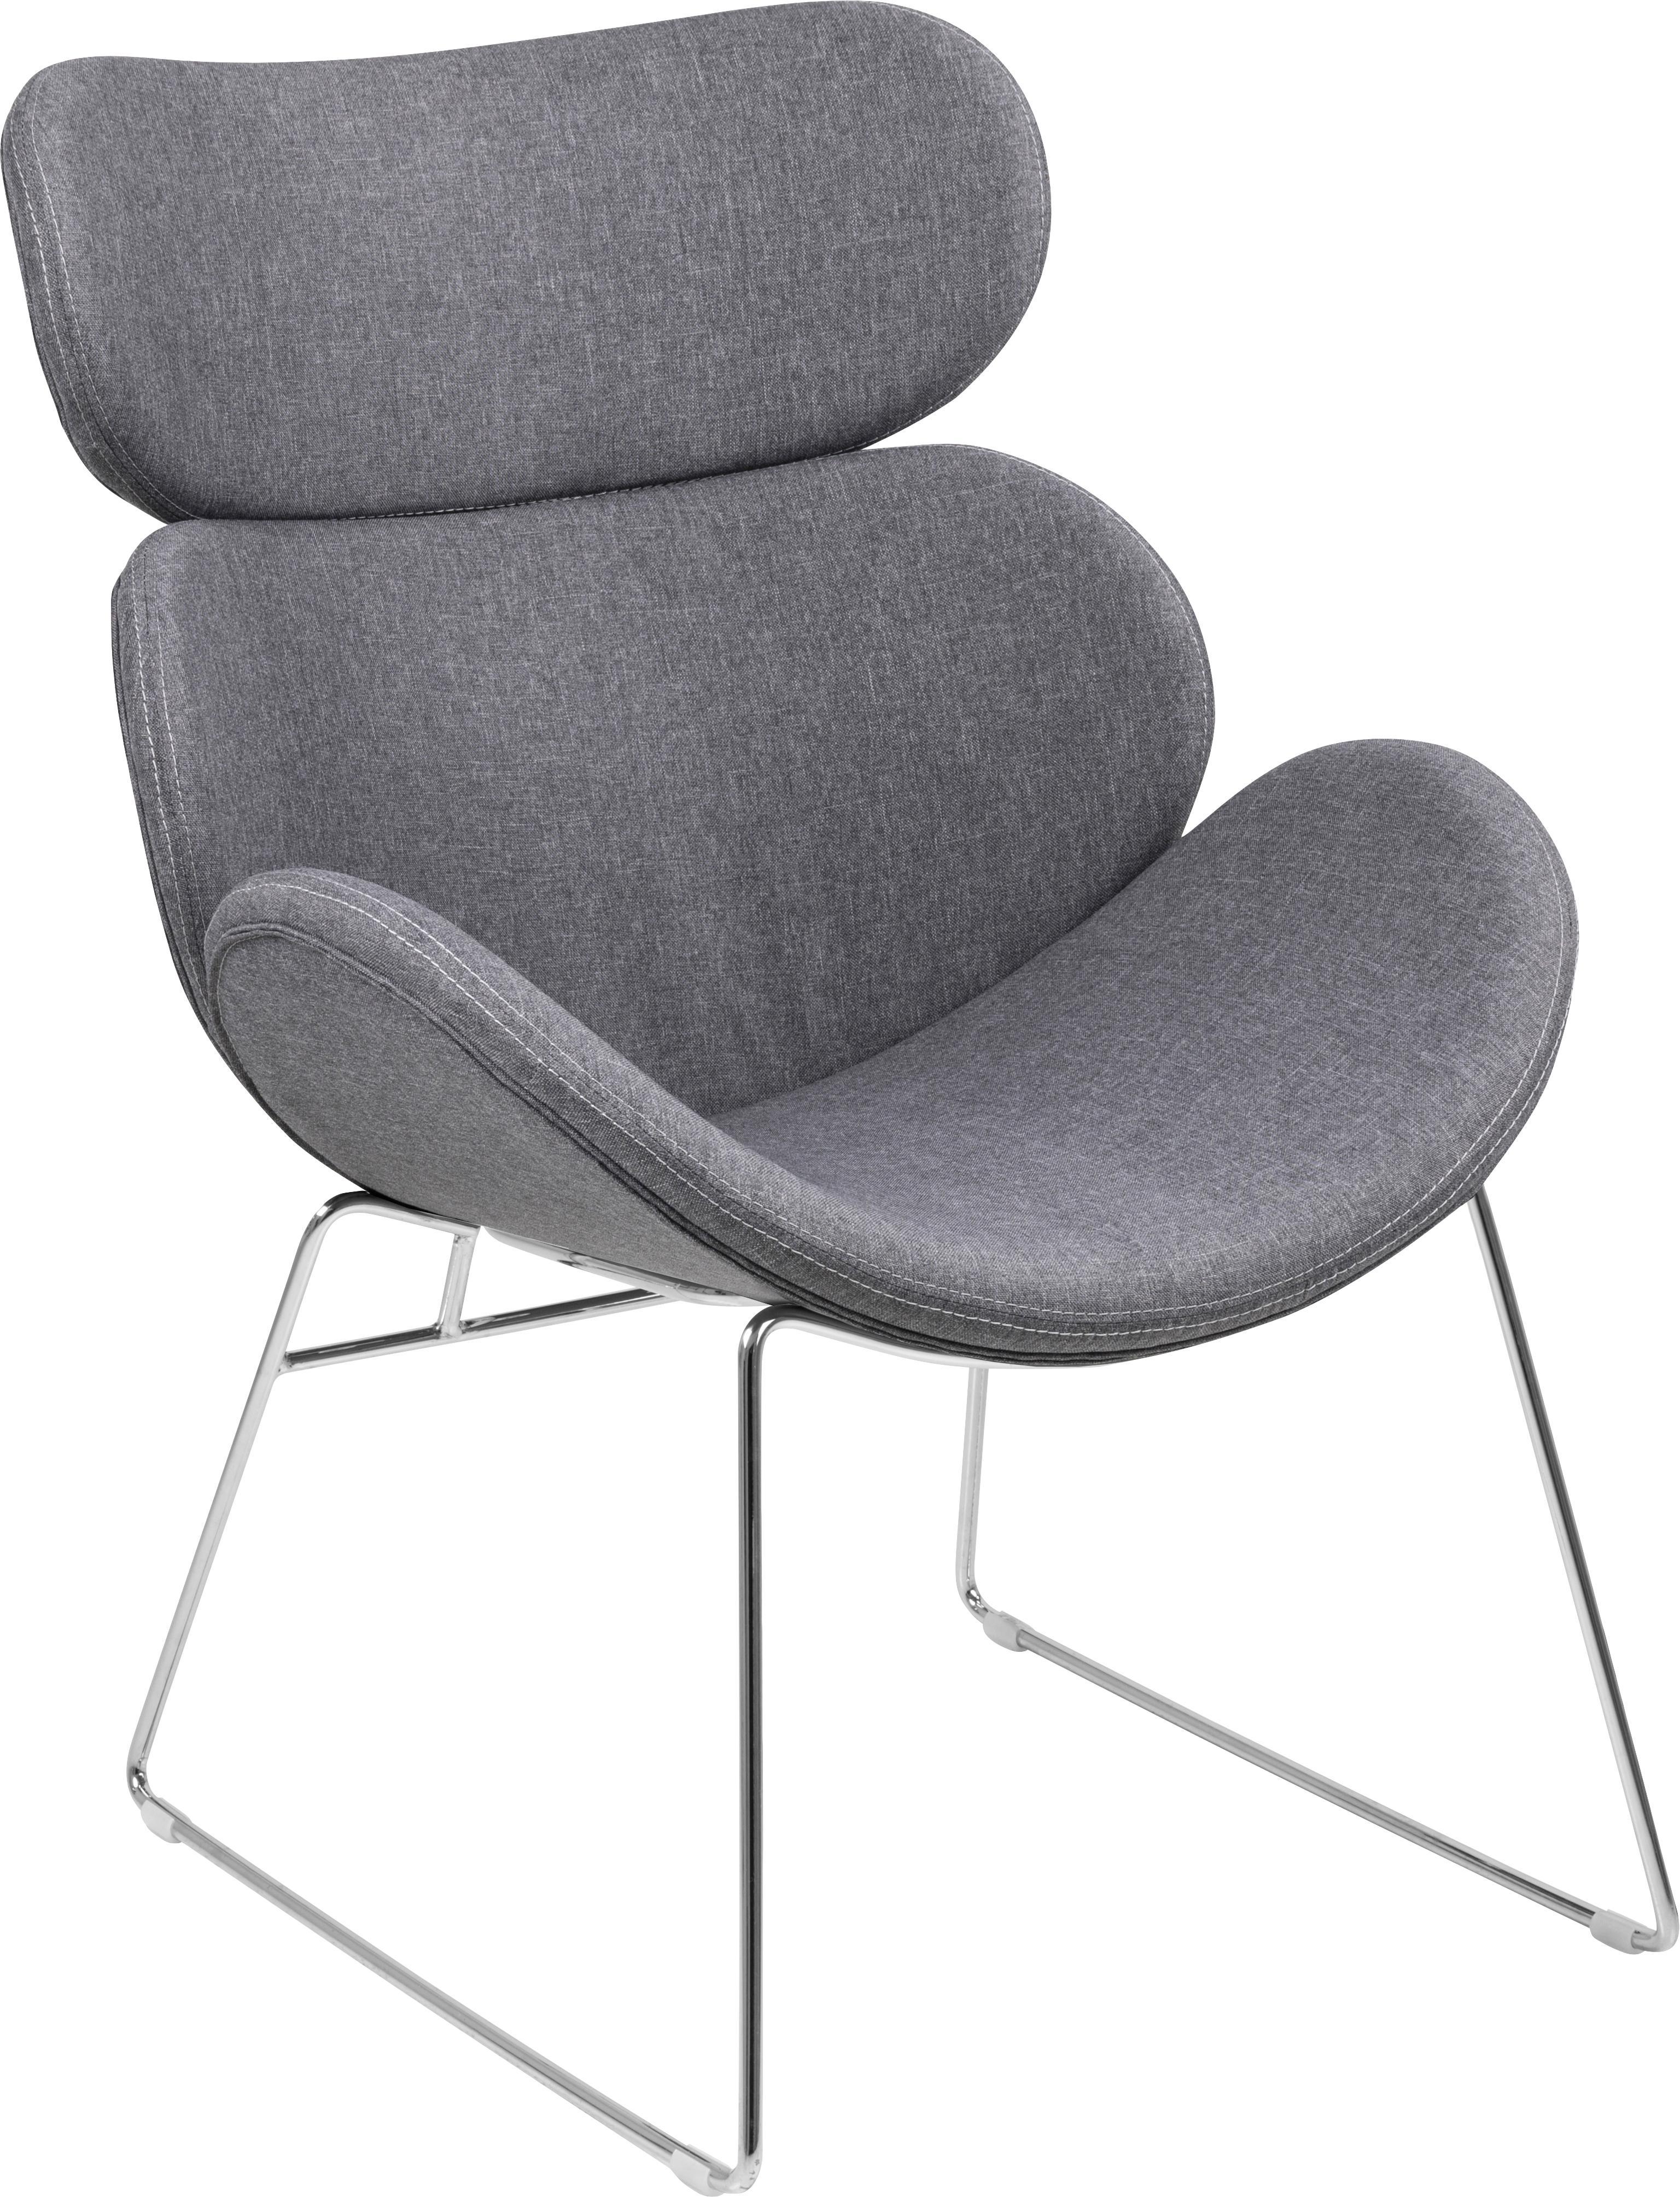 Moderner Loungesessel Cazar in Hellgrau, Bezug: Polyester, Gestell: Metall, verchromt, Webstoff Hellgrau, B 69 x T 79 cm